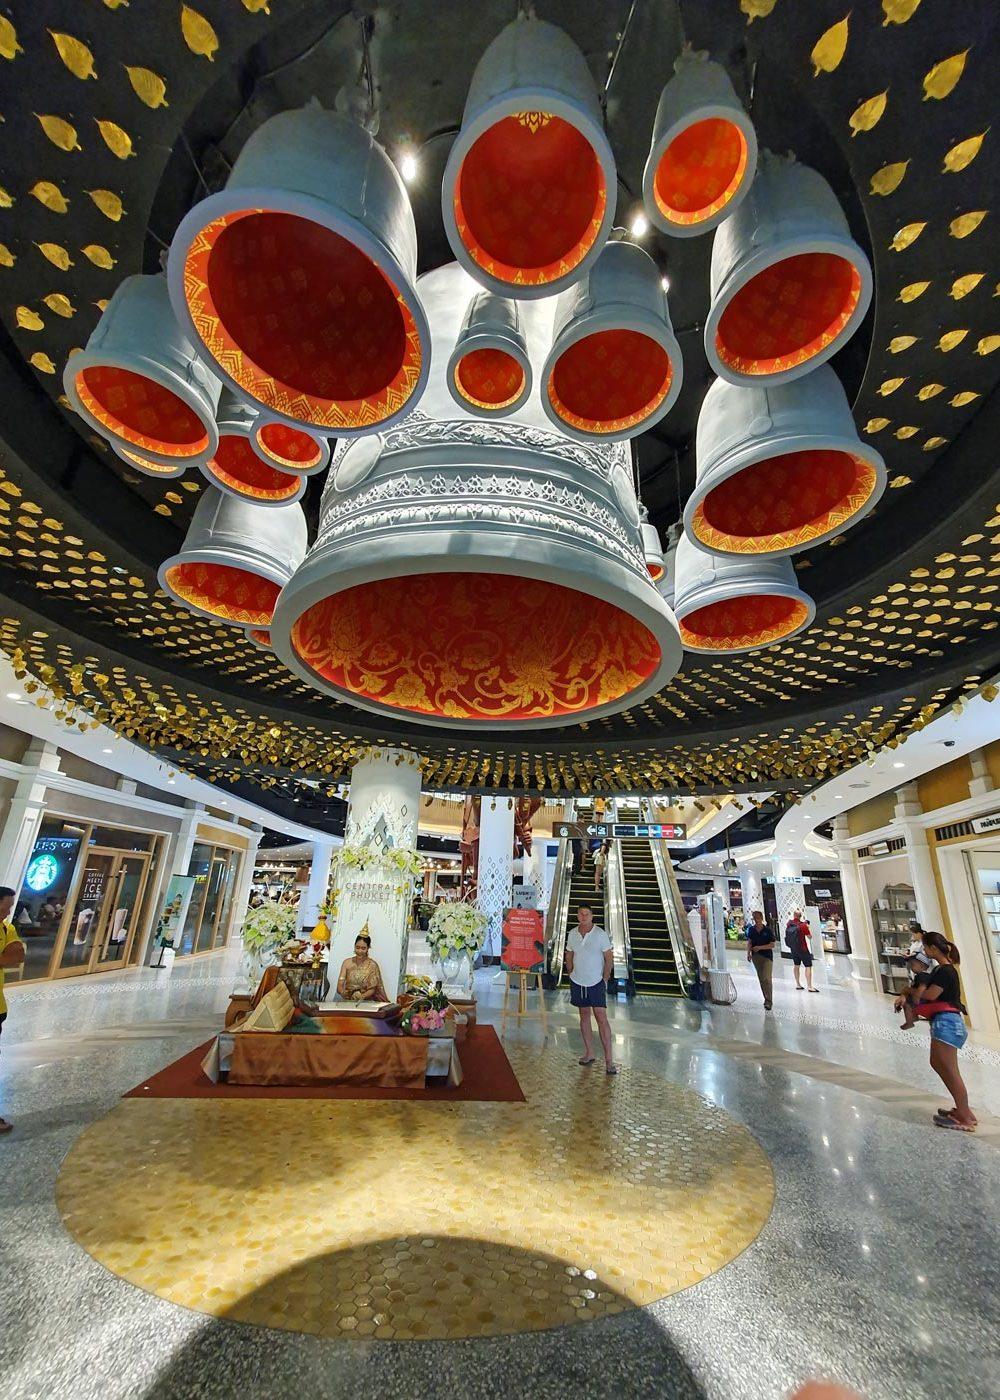 Phuket Shopping, Central Floresta, Jungceylon, Ayurveda, Wellness, Yoga Retreats, Phuket Thailand, Mangosteen Ayurveda & Wellness Resort, Number 1 Ayurveda Resort in Thailand, Rawai, Phuket.